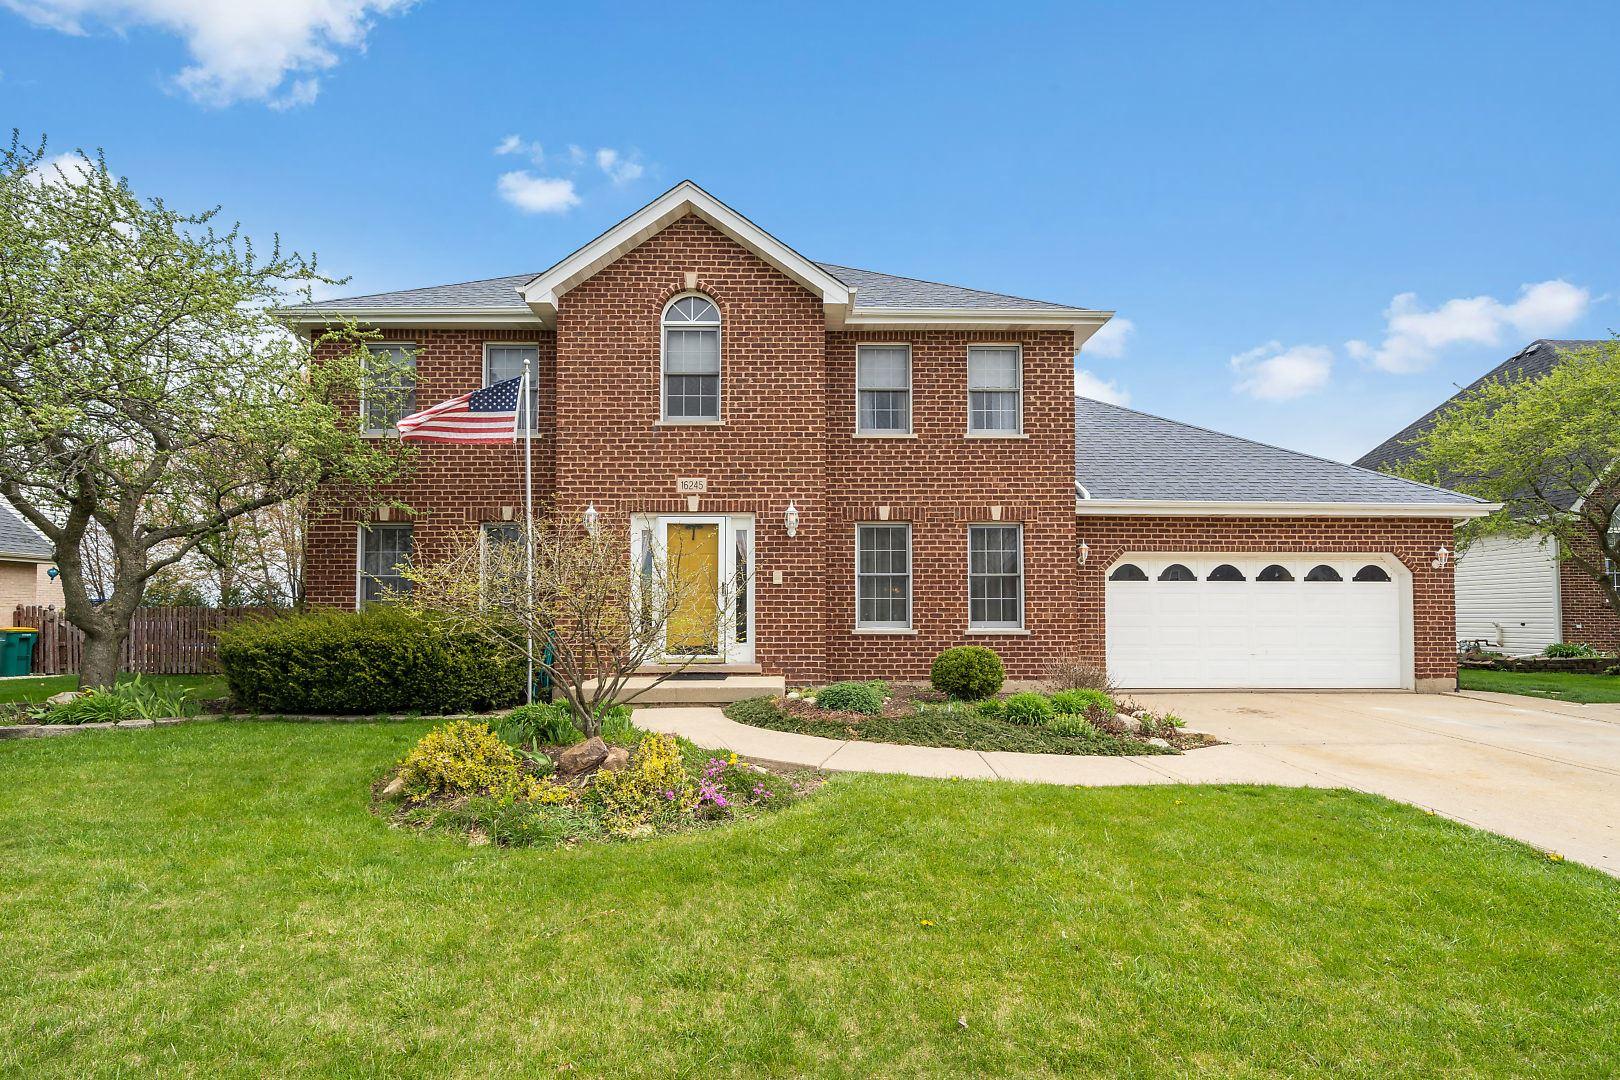 16245 Burgundy Drive, Plainfield, IL 60586 - #: 10697743